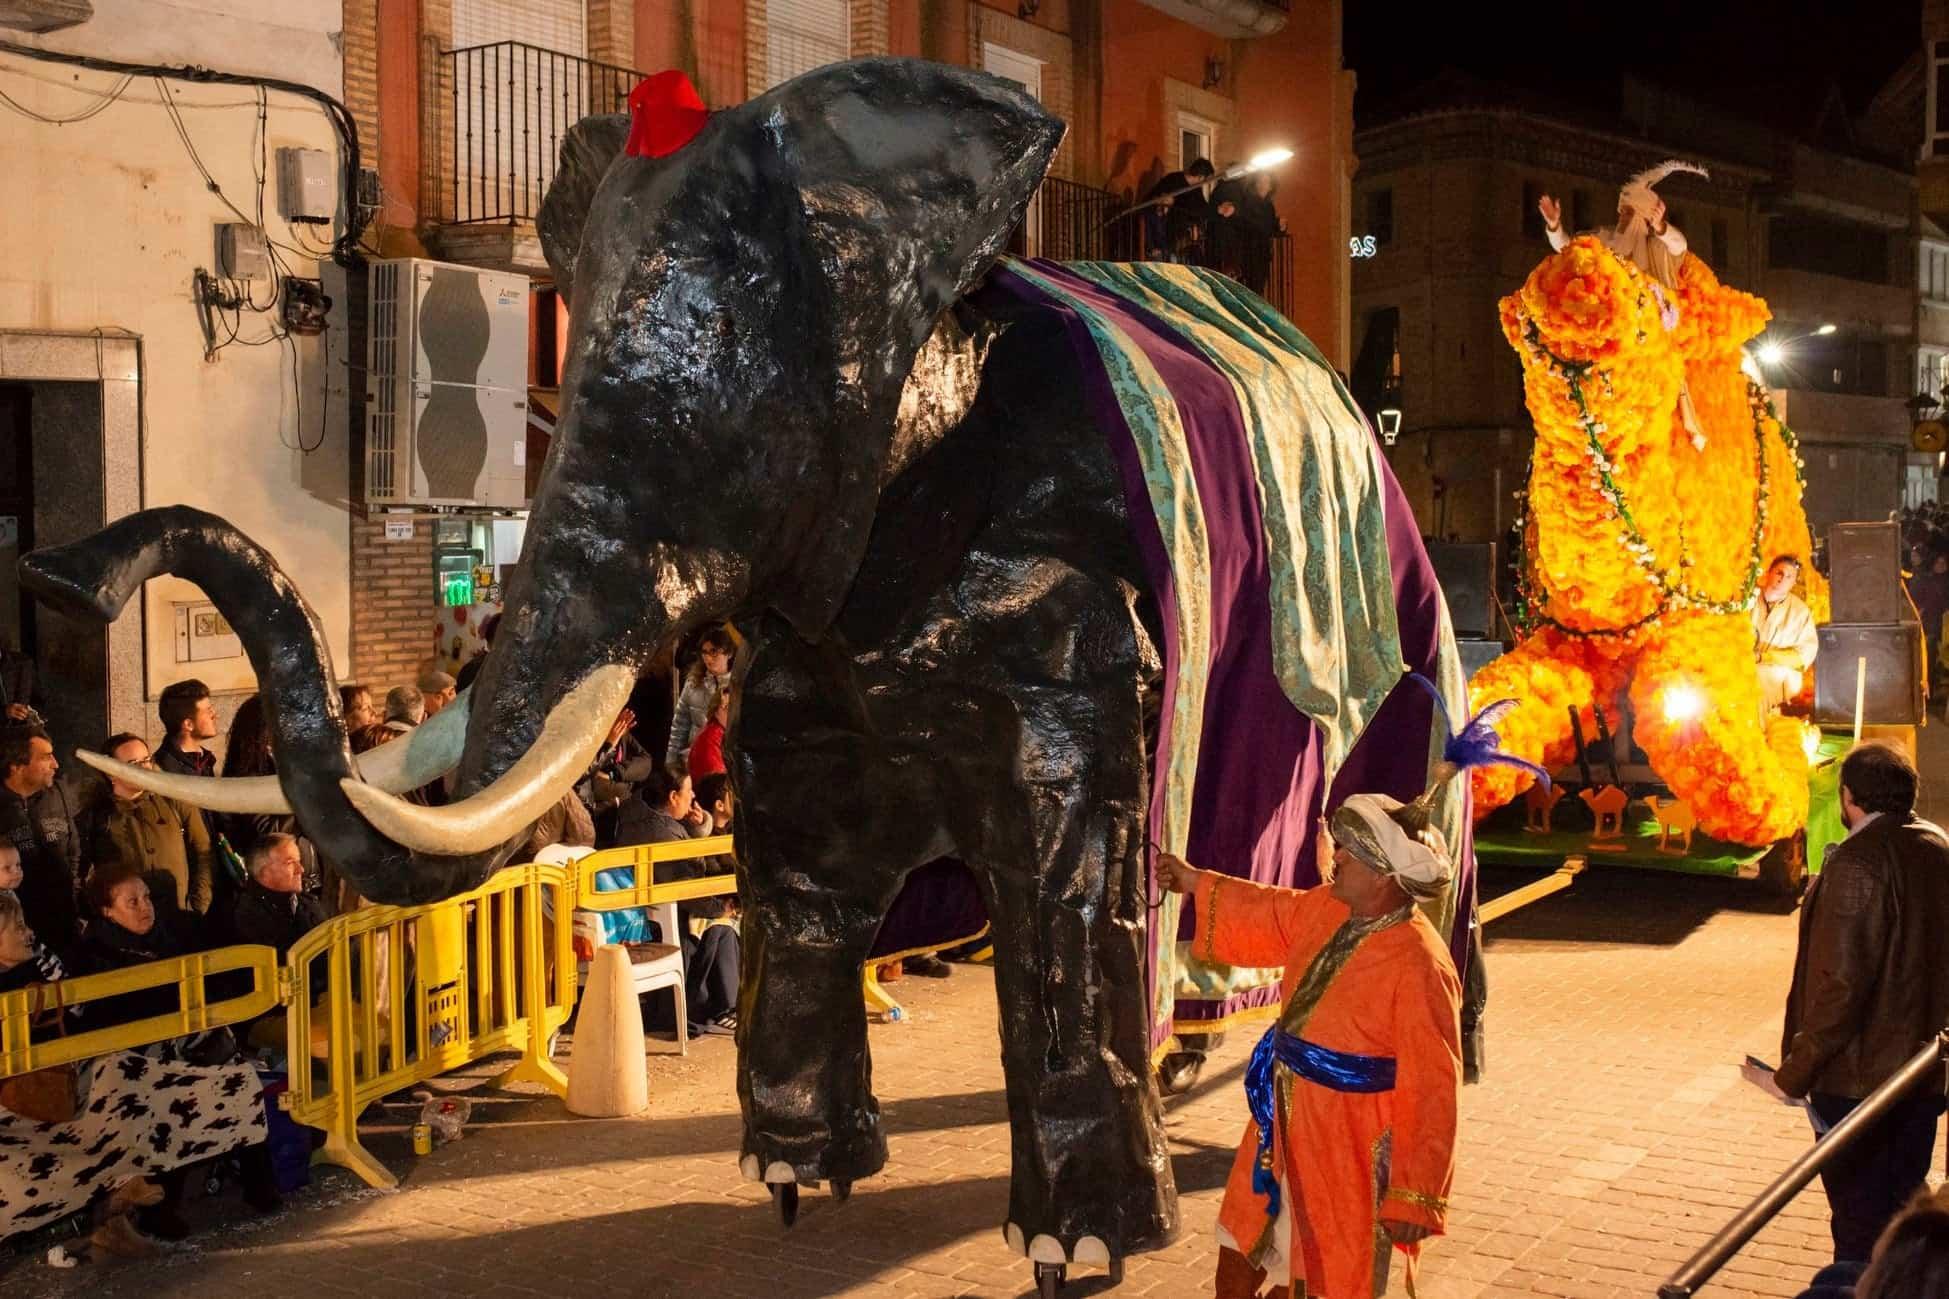 Carnaval de herencia 2020 ofertorio 56 - Selección de fotografías del Ofertorio del Carnaval de Herencia